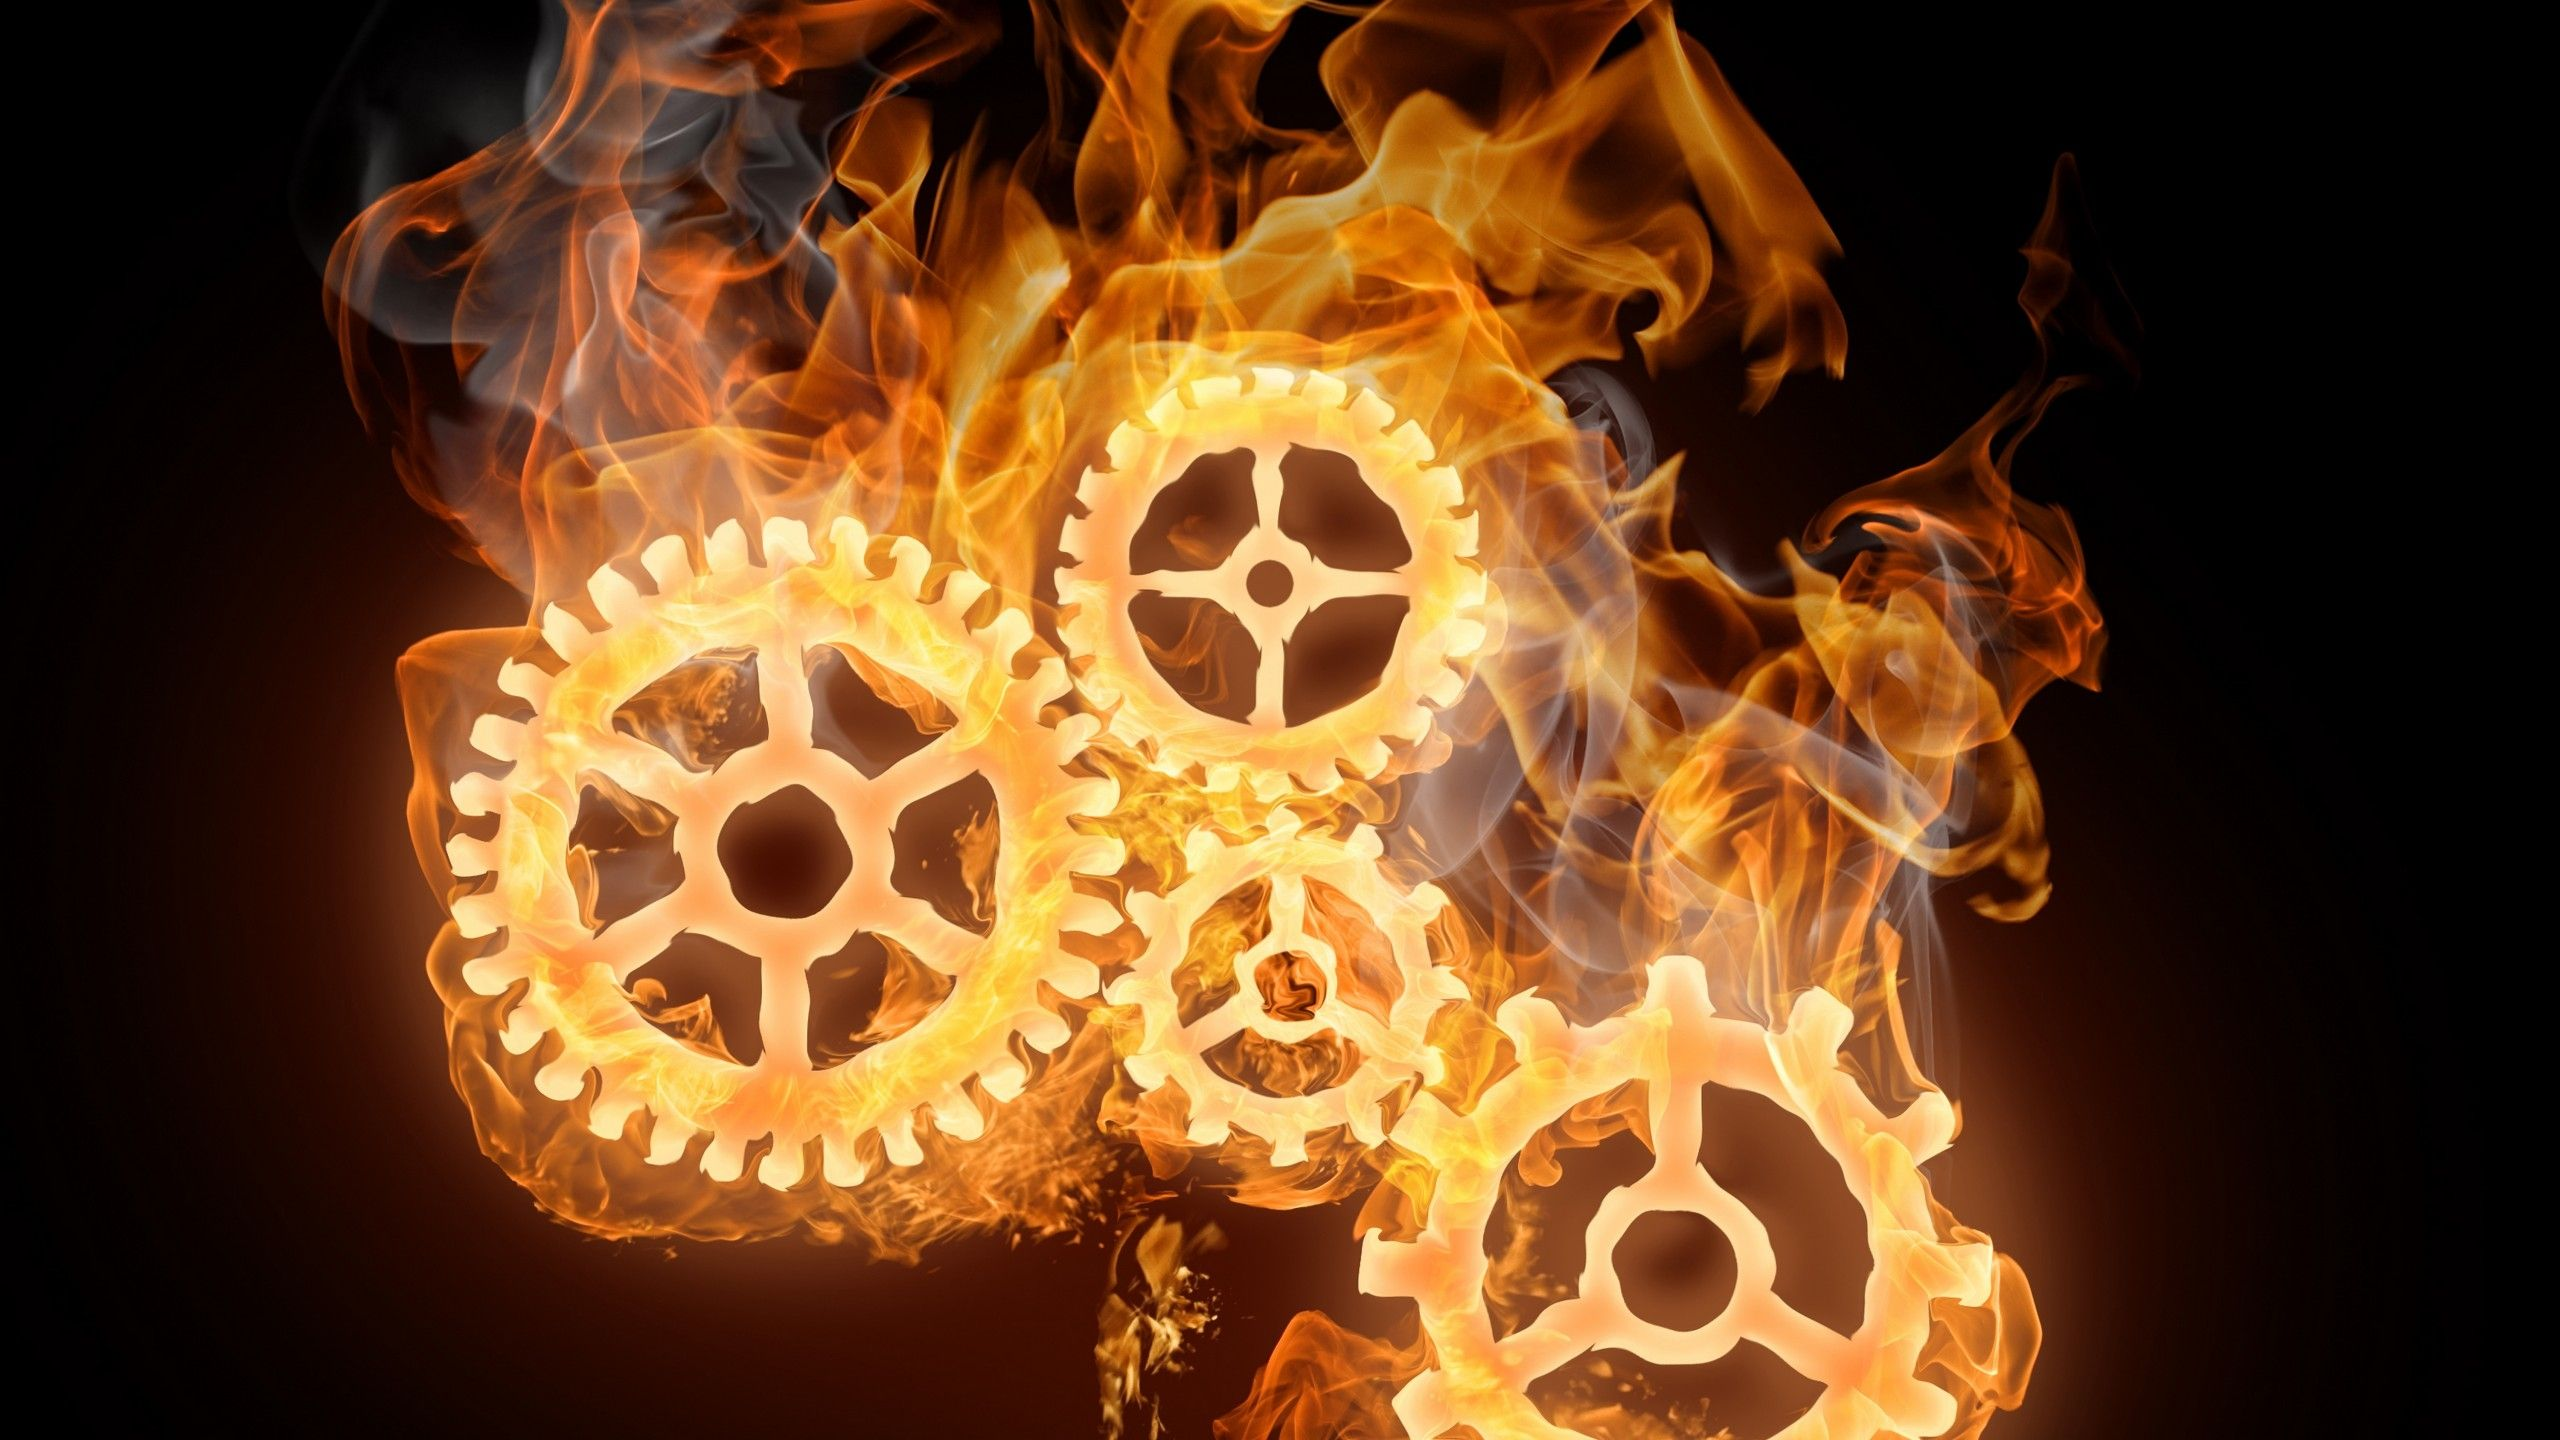 Steampunk Cog Wheels Steampunk Fire Flames Smoke 3D